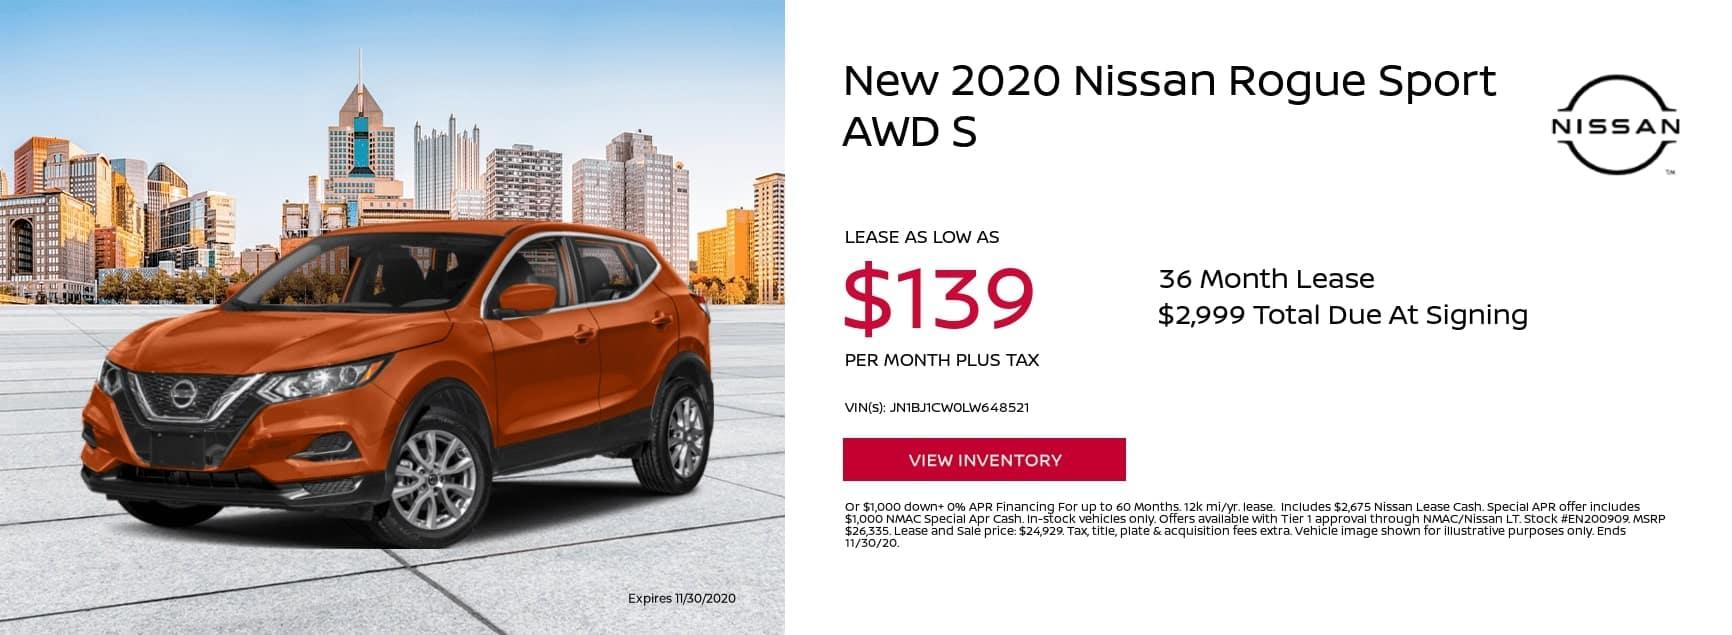 2020-Nissan-Rogue-Sport-AWD-S-72